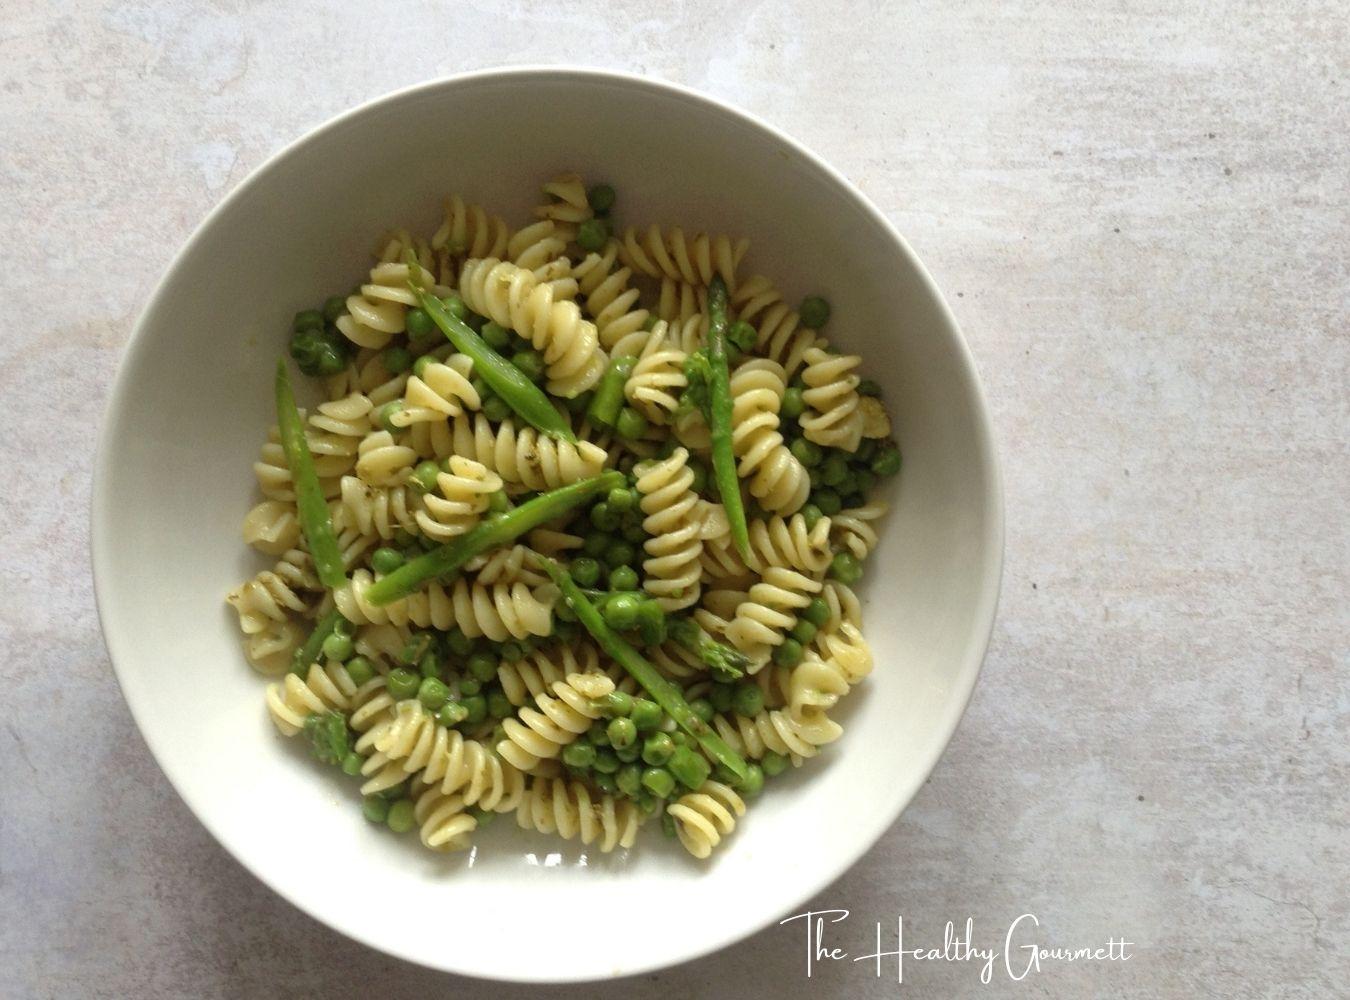 Pasta with pesto, asparagus and peas